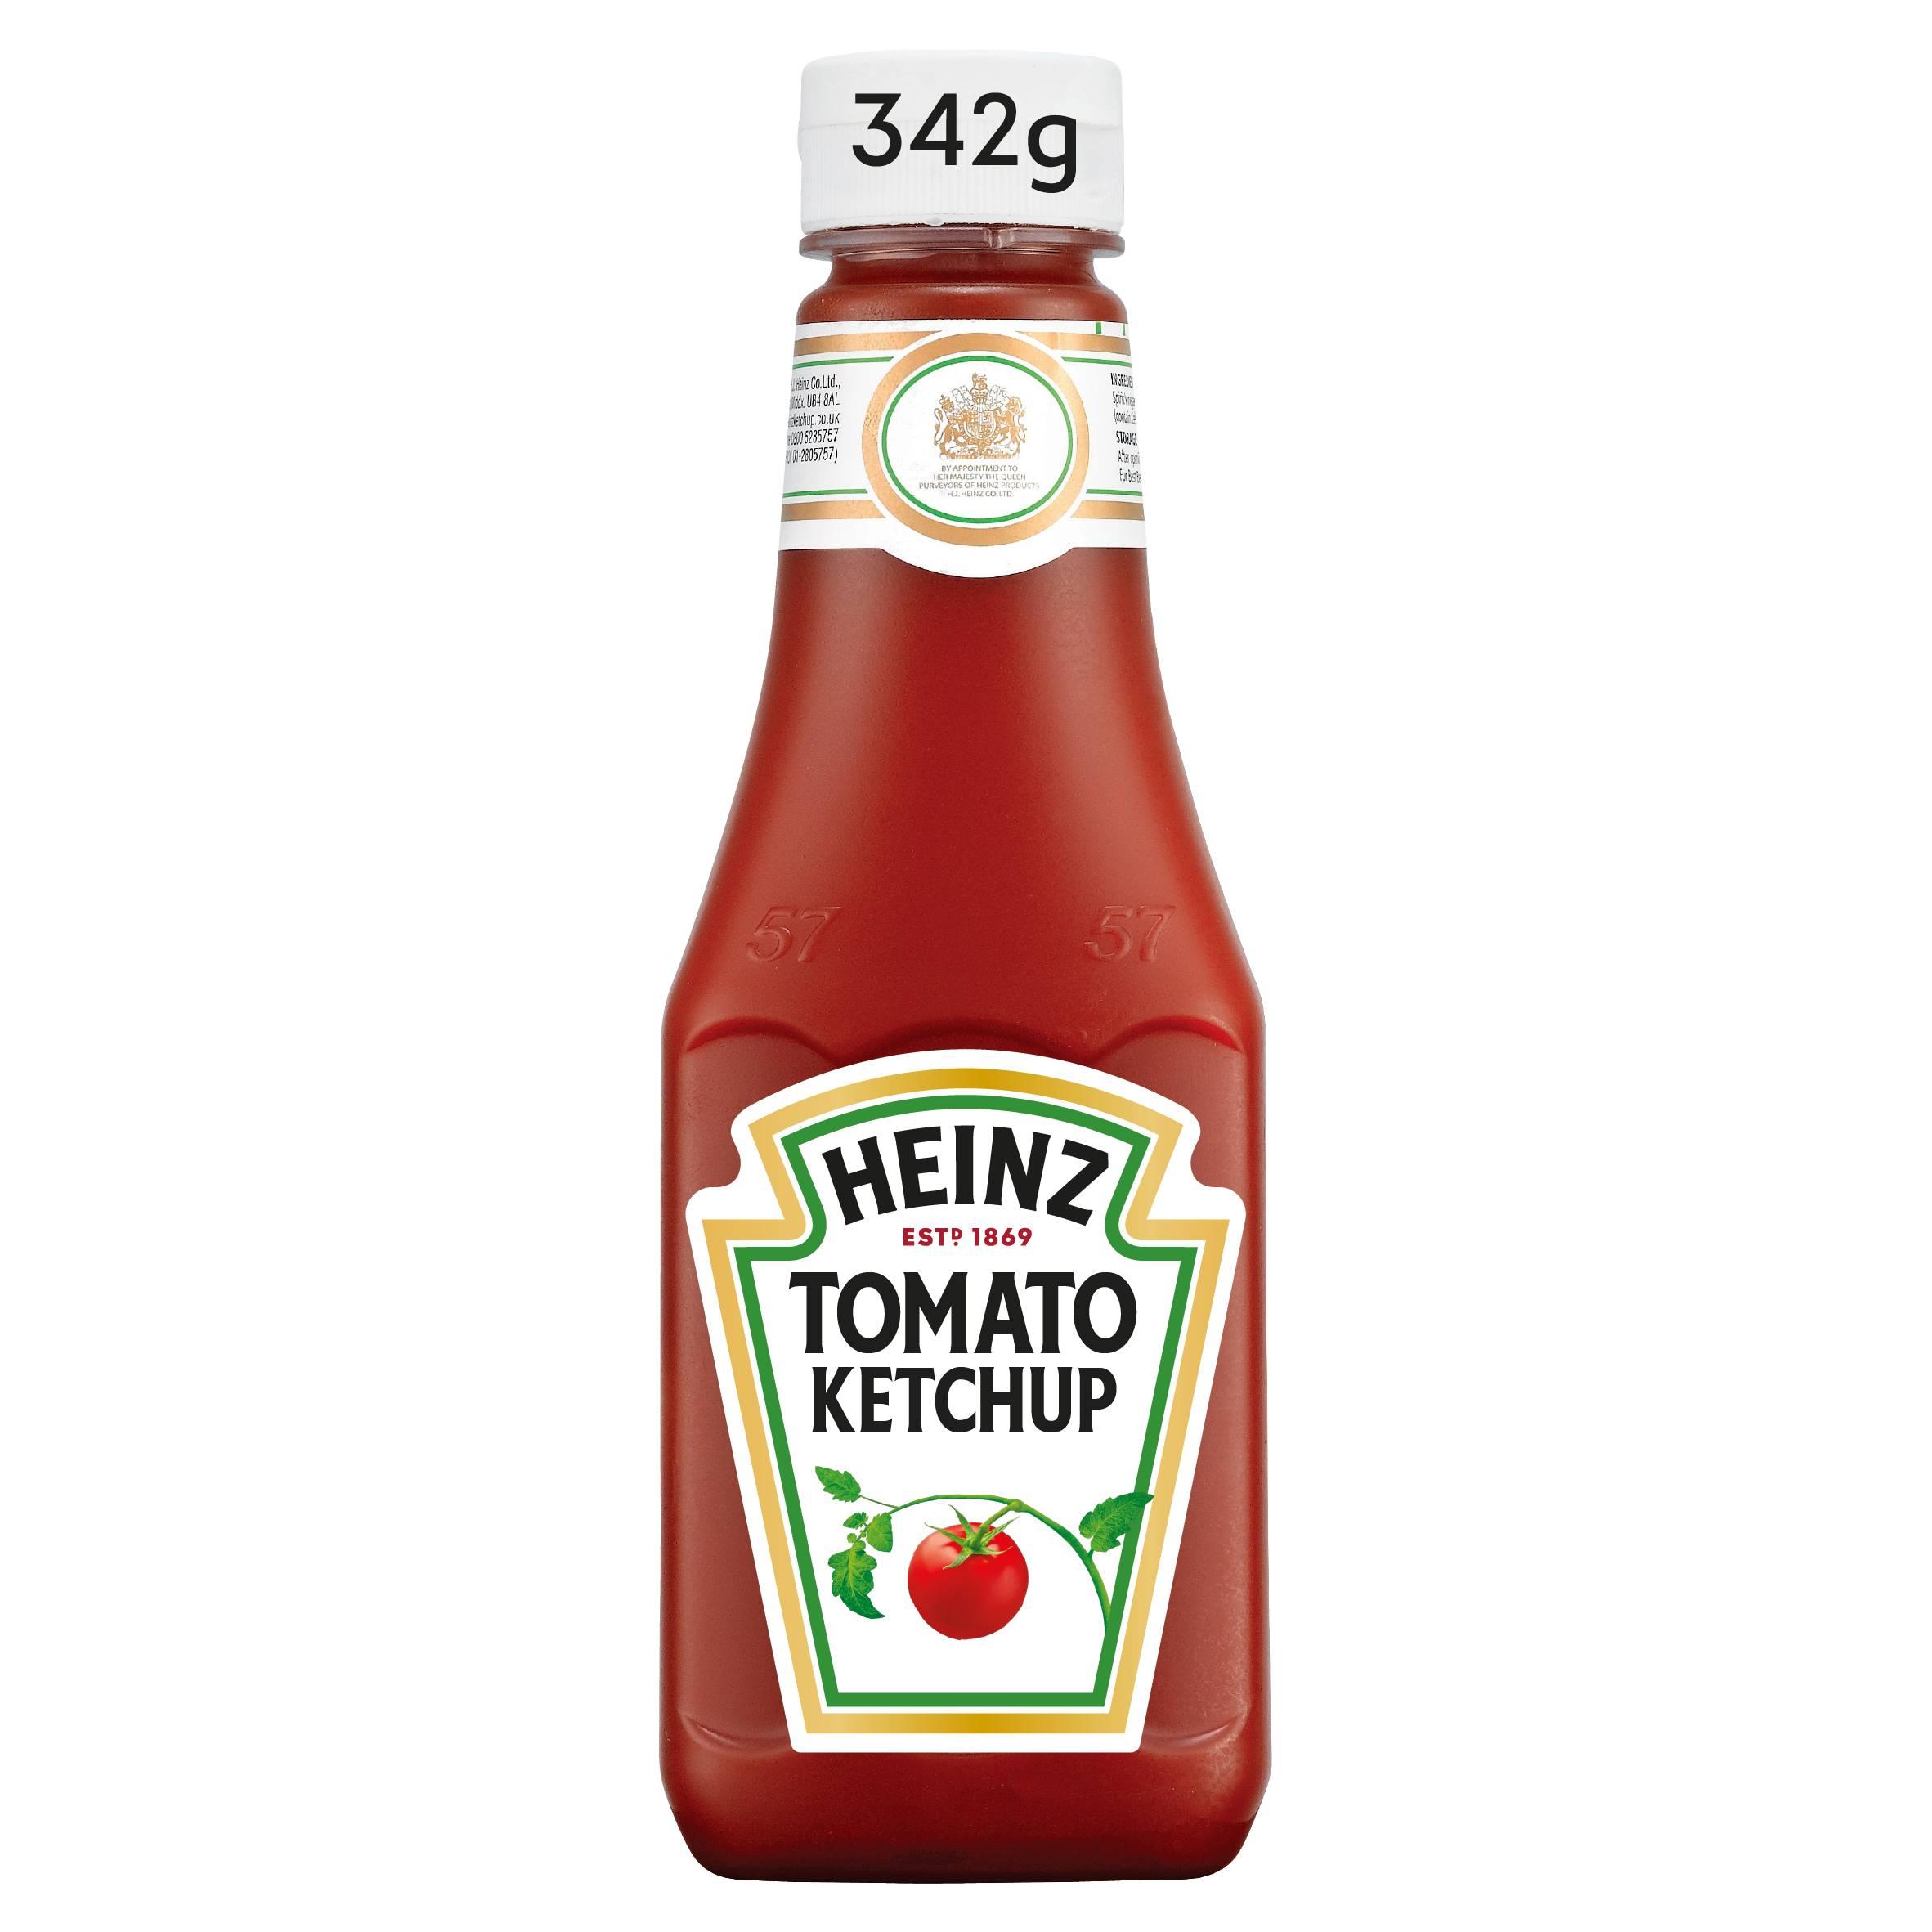 Heinz Tomato Ketchup 300ml fles image